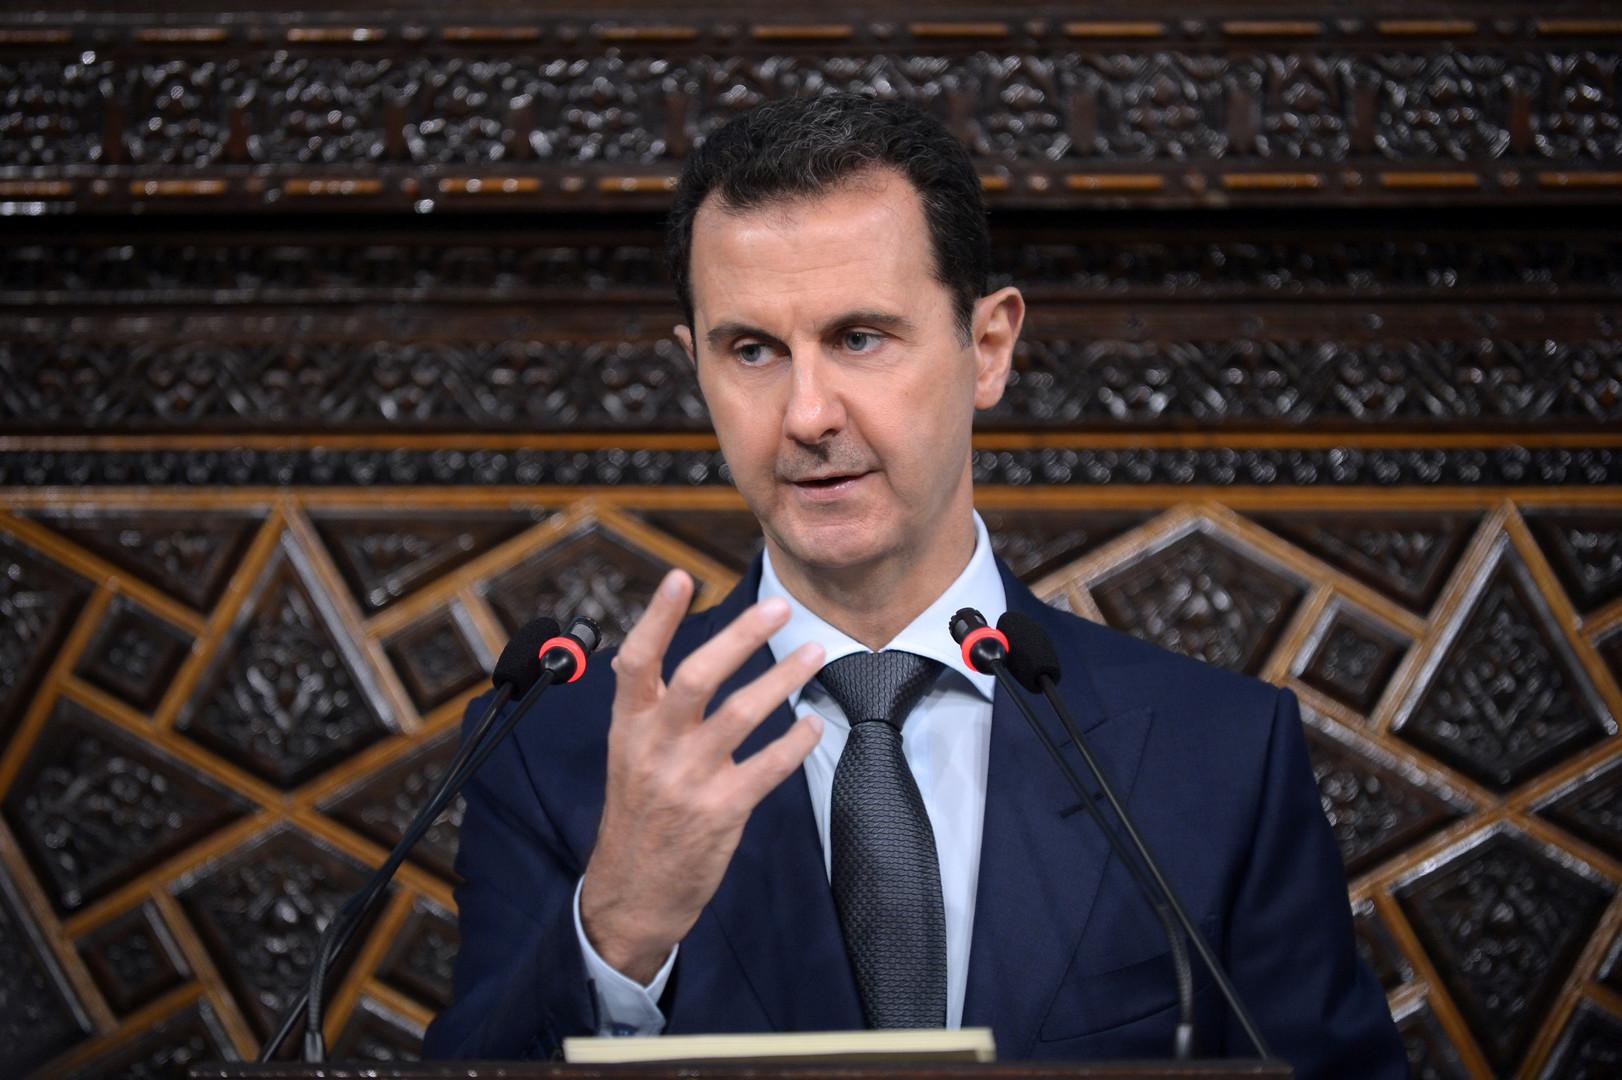 Башар Асад: Надеюсь остаться в истории как защитник Сирии от терроризма